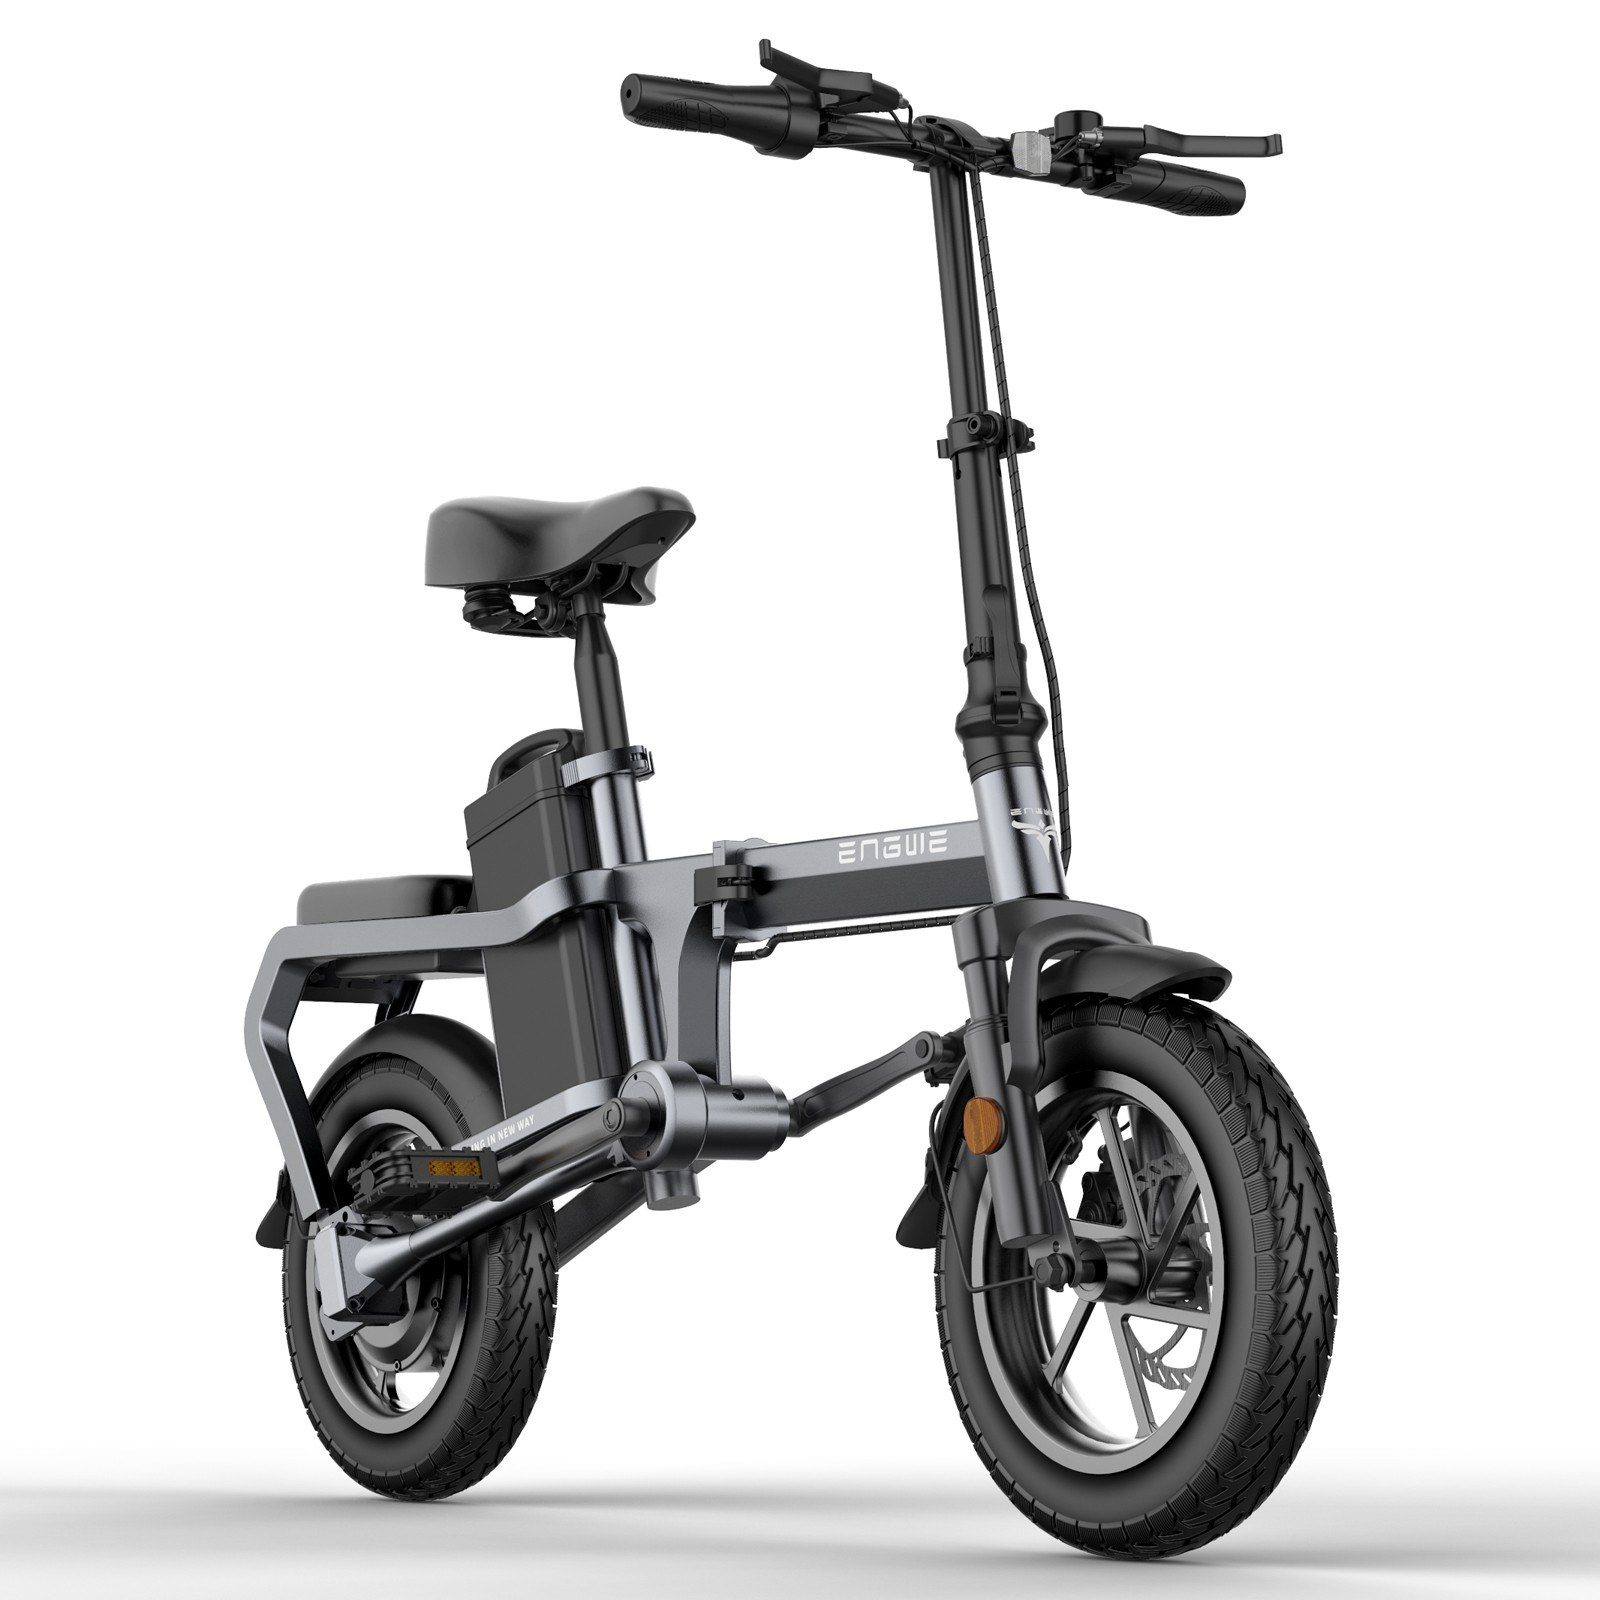 Cafago - 50% OFF ENGWE X5S 350W 14 Inch Folding Electric Bike,free shipping+$825.23